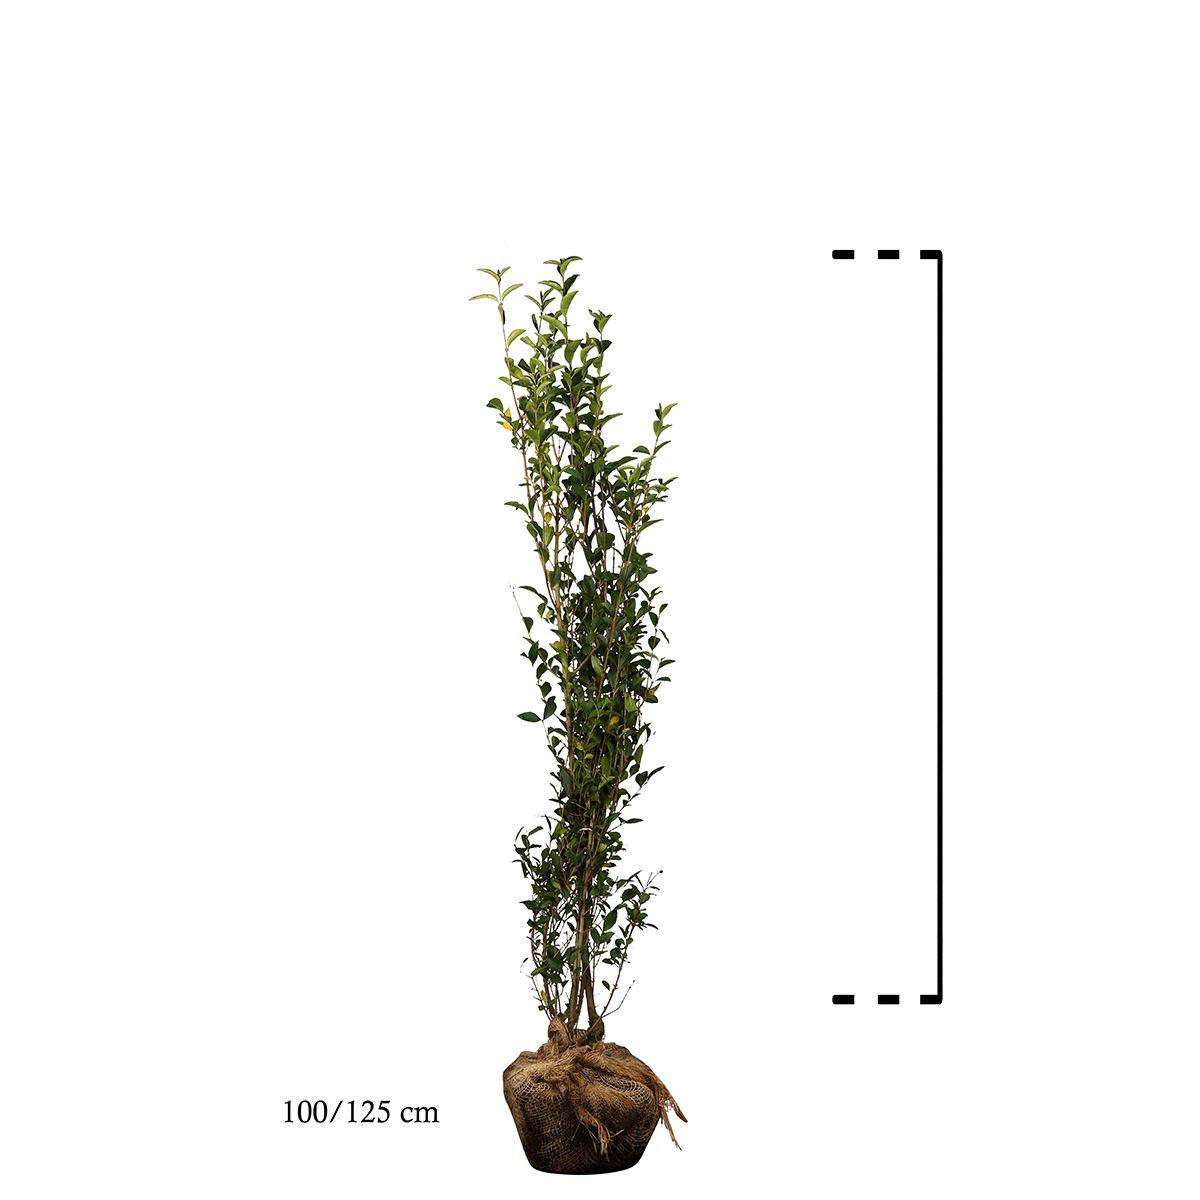 Ovalblättriger Liguster  Wurzelballen 100-125 cm